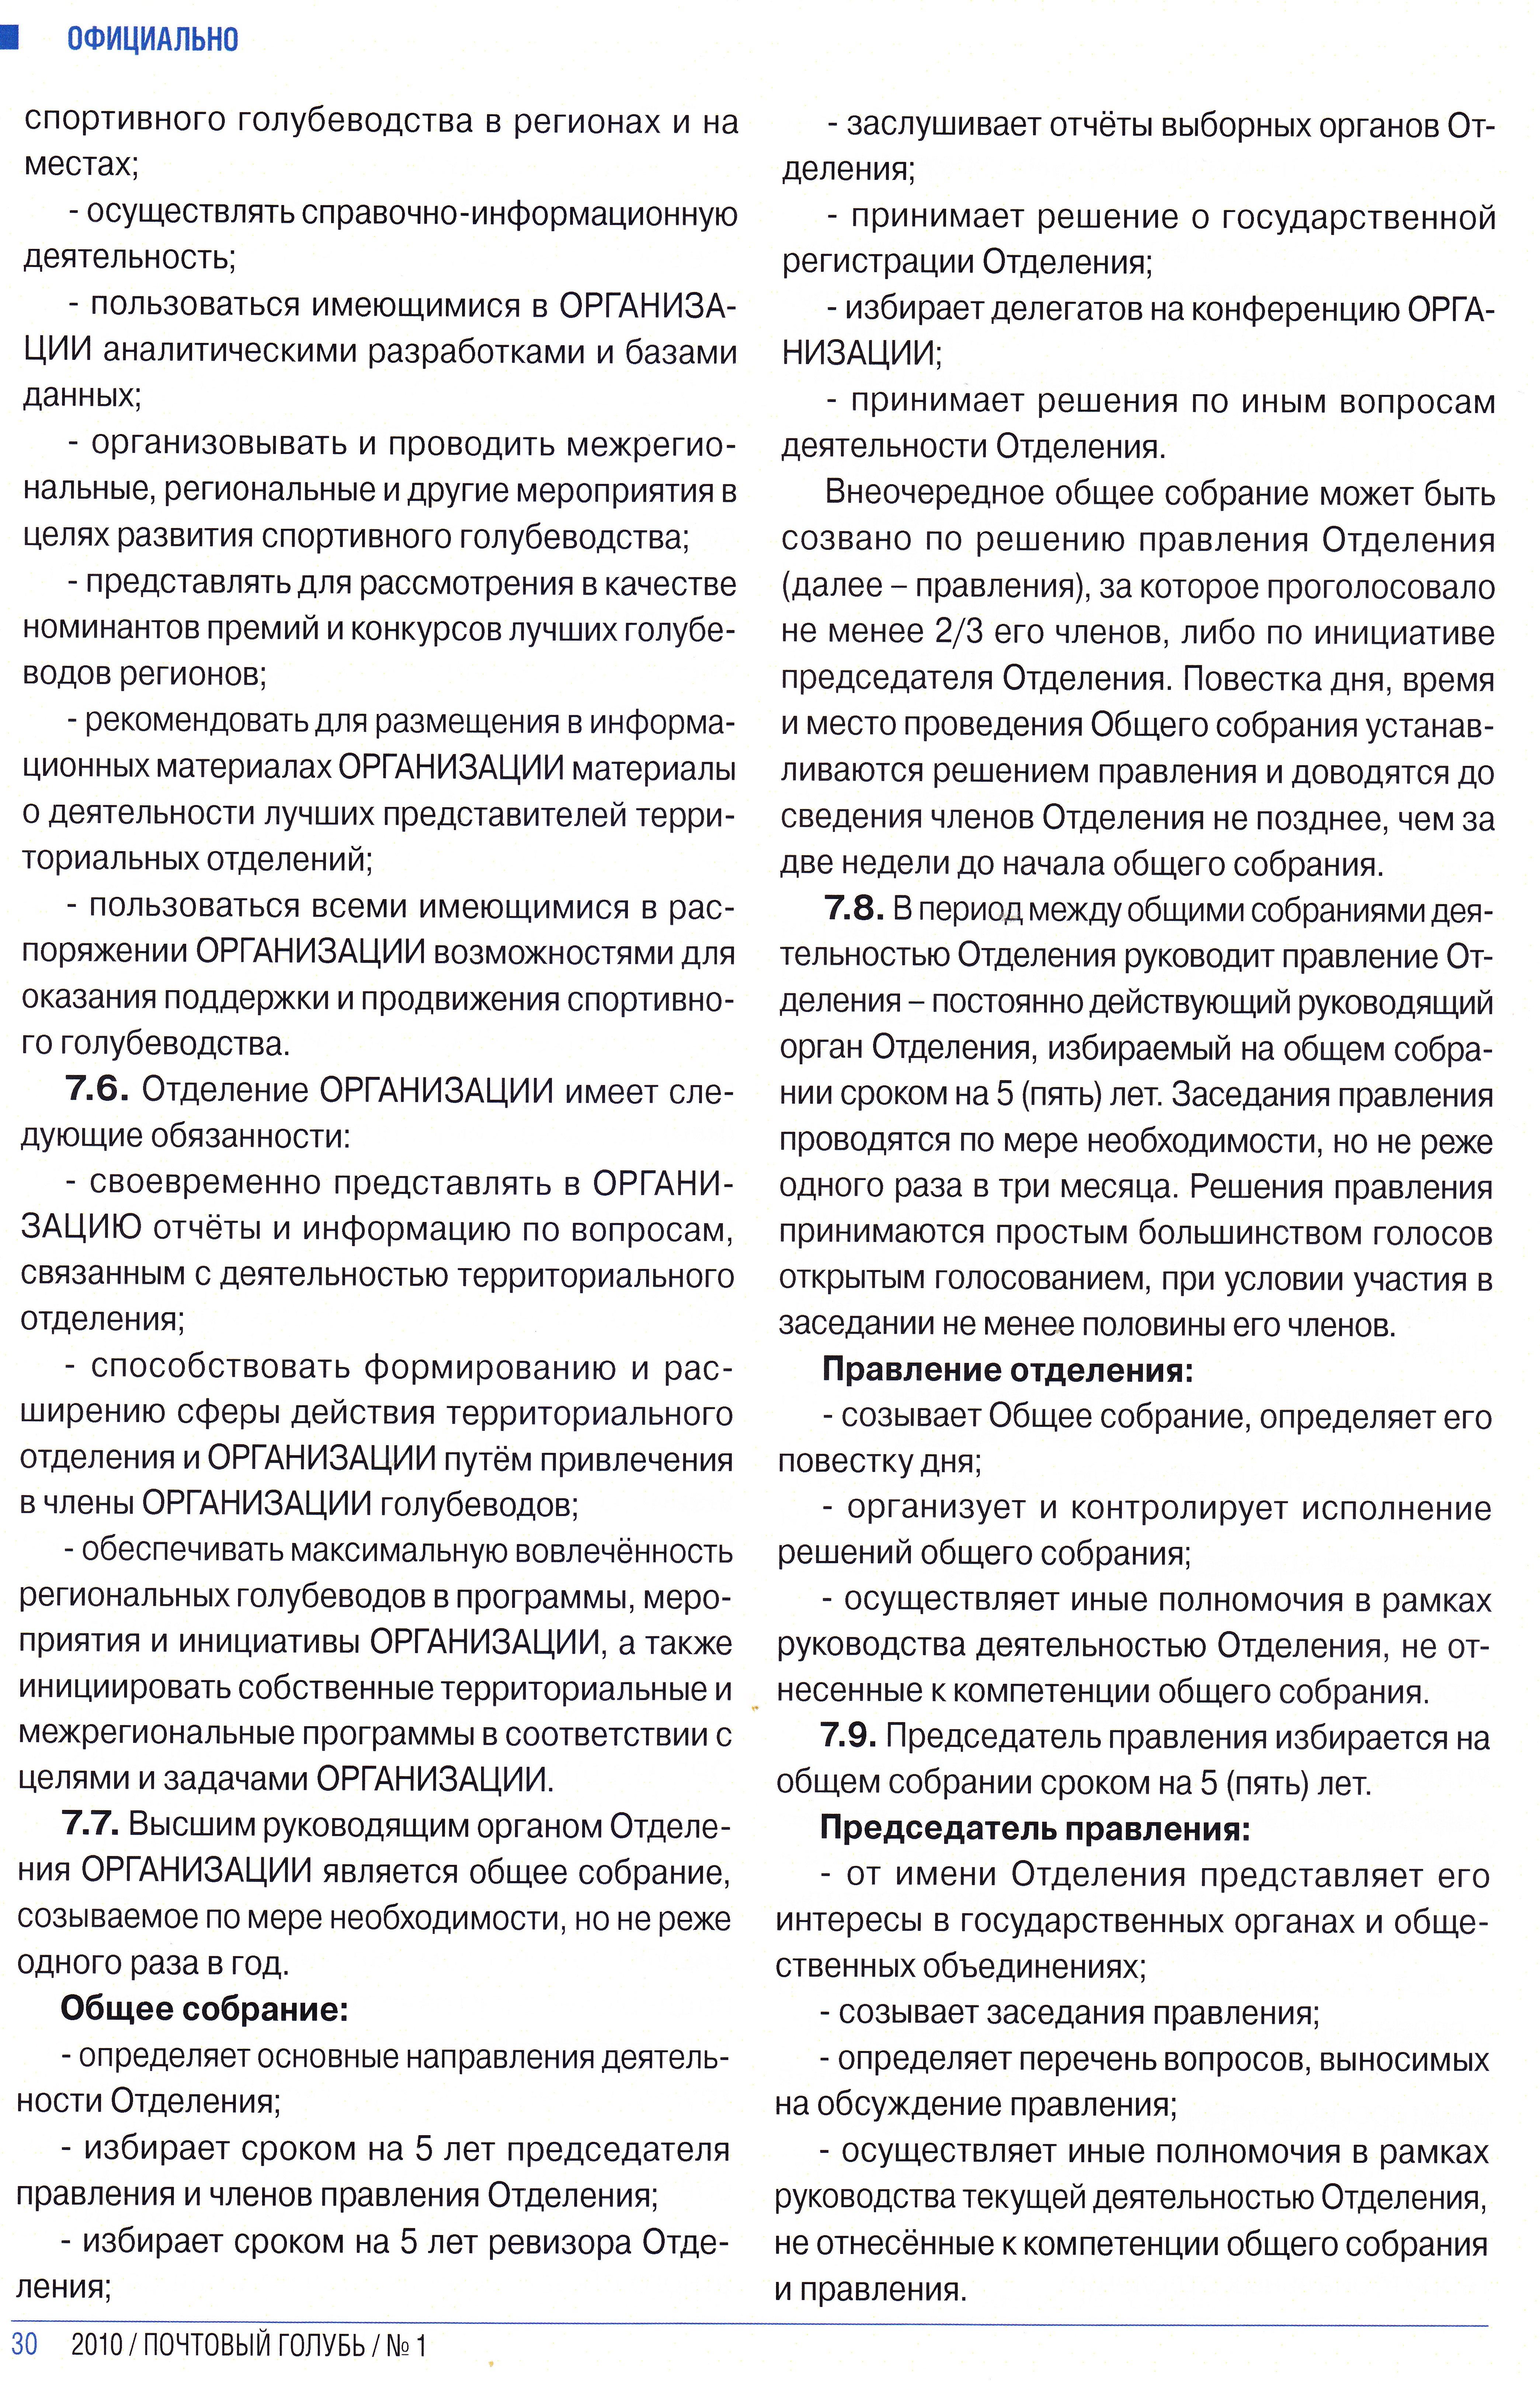 http://forumupload.ru/uploads/0012/5a/ef/2/996905.jpg